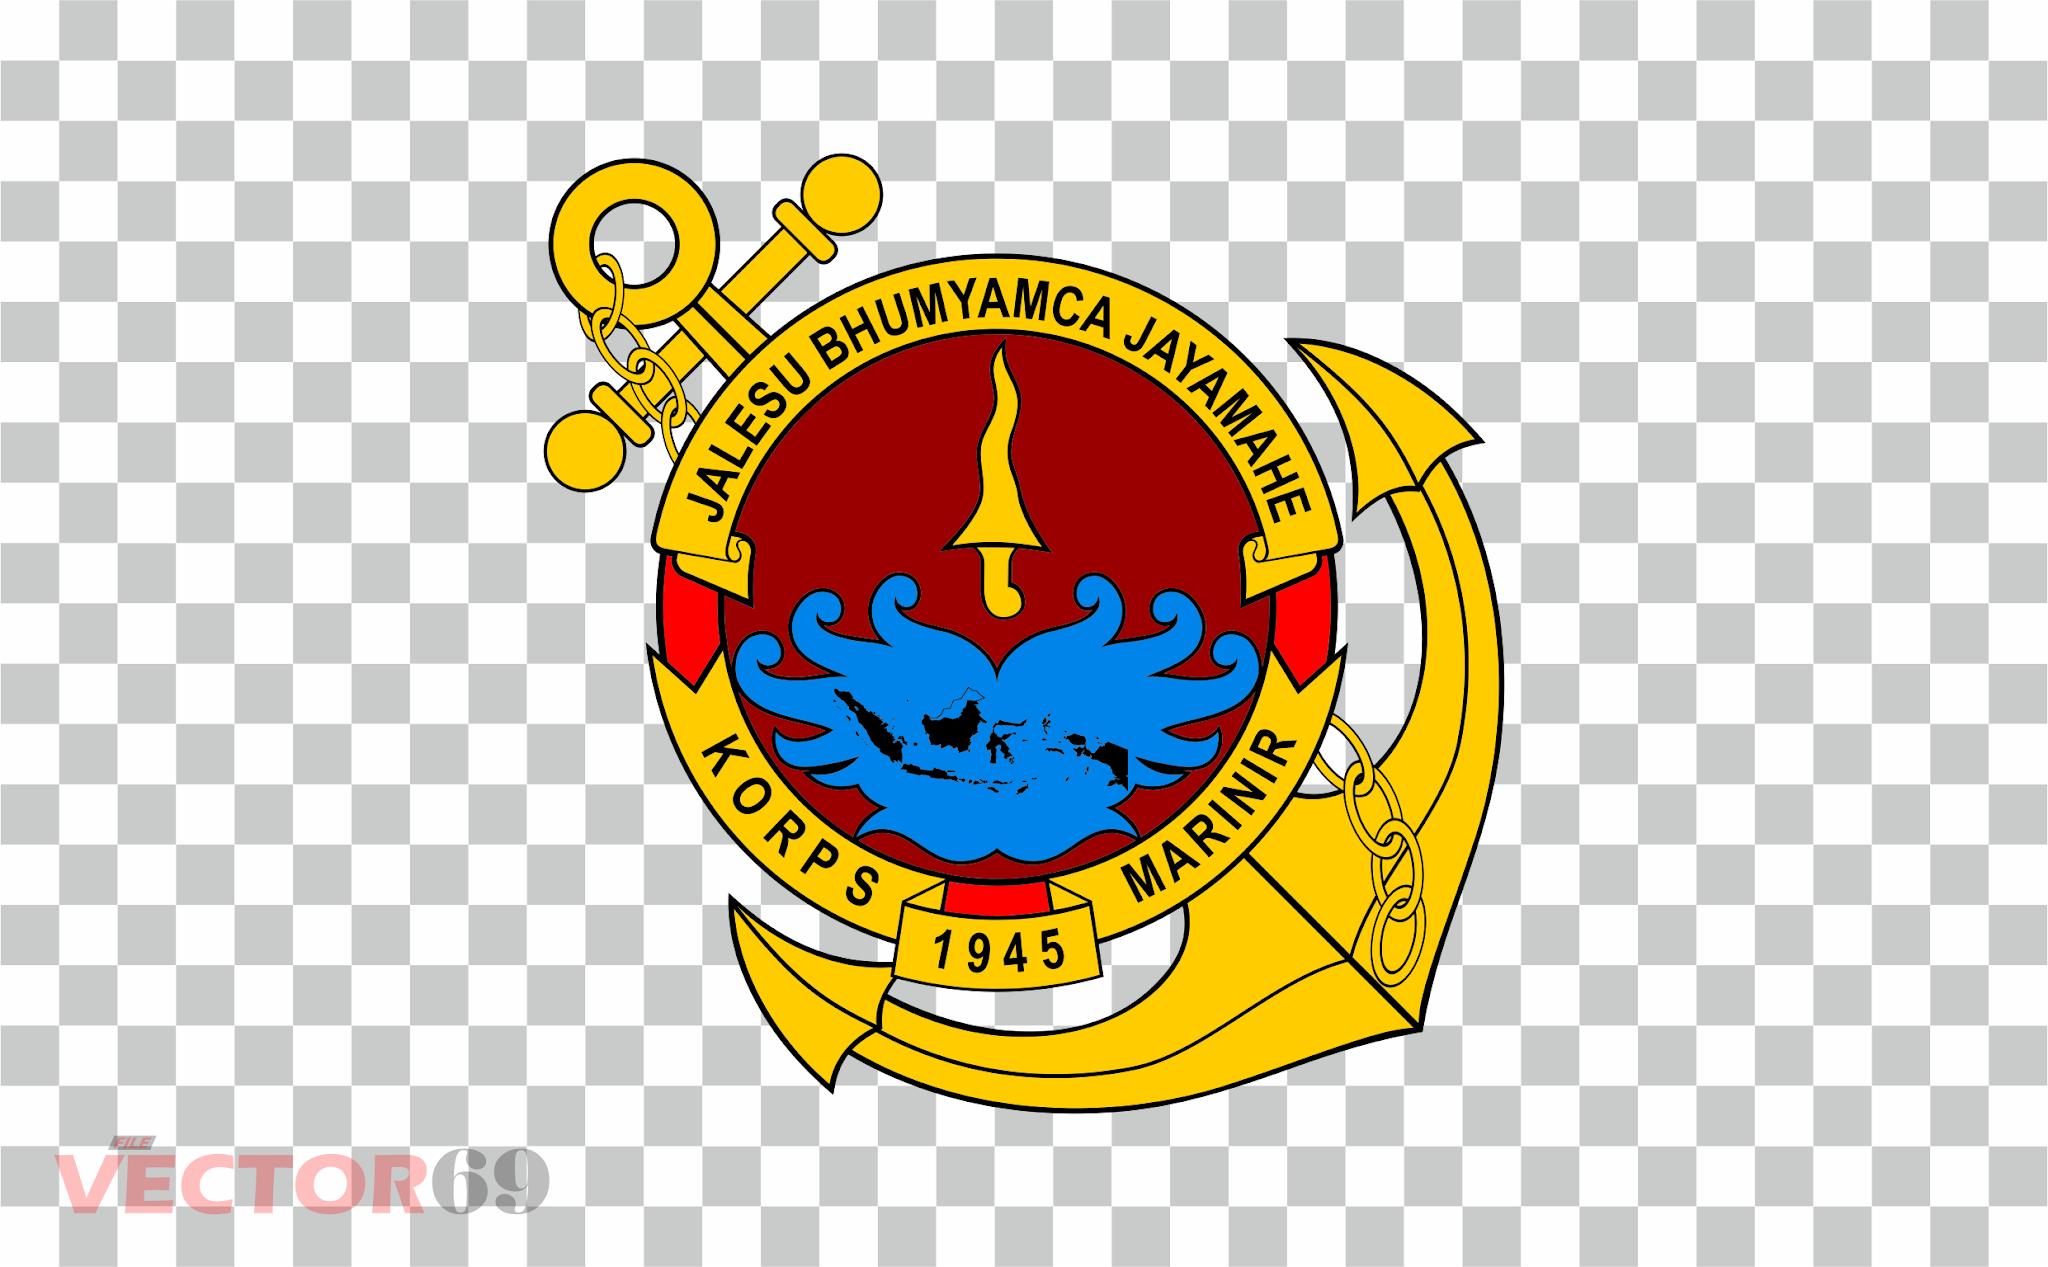 Korps Marinir Indonesia Logo - Download Vector File PNG (Portable Network Graphics)